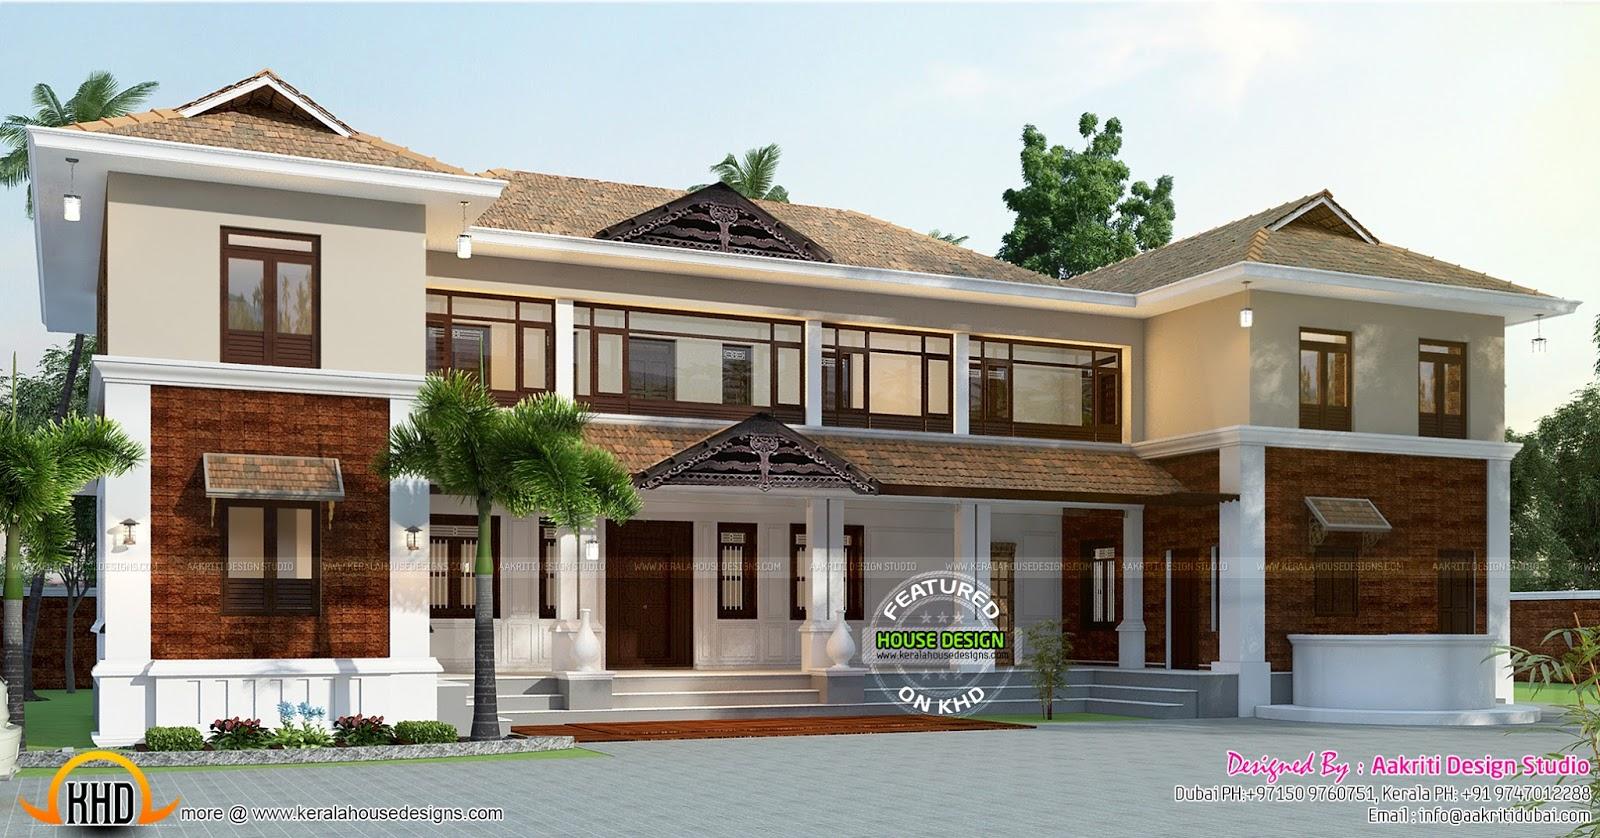 house renovation work by aakriti design studio kerala kitchen cabinet renovation renovation contractor